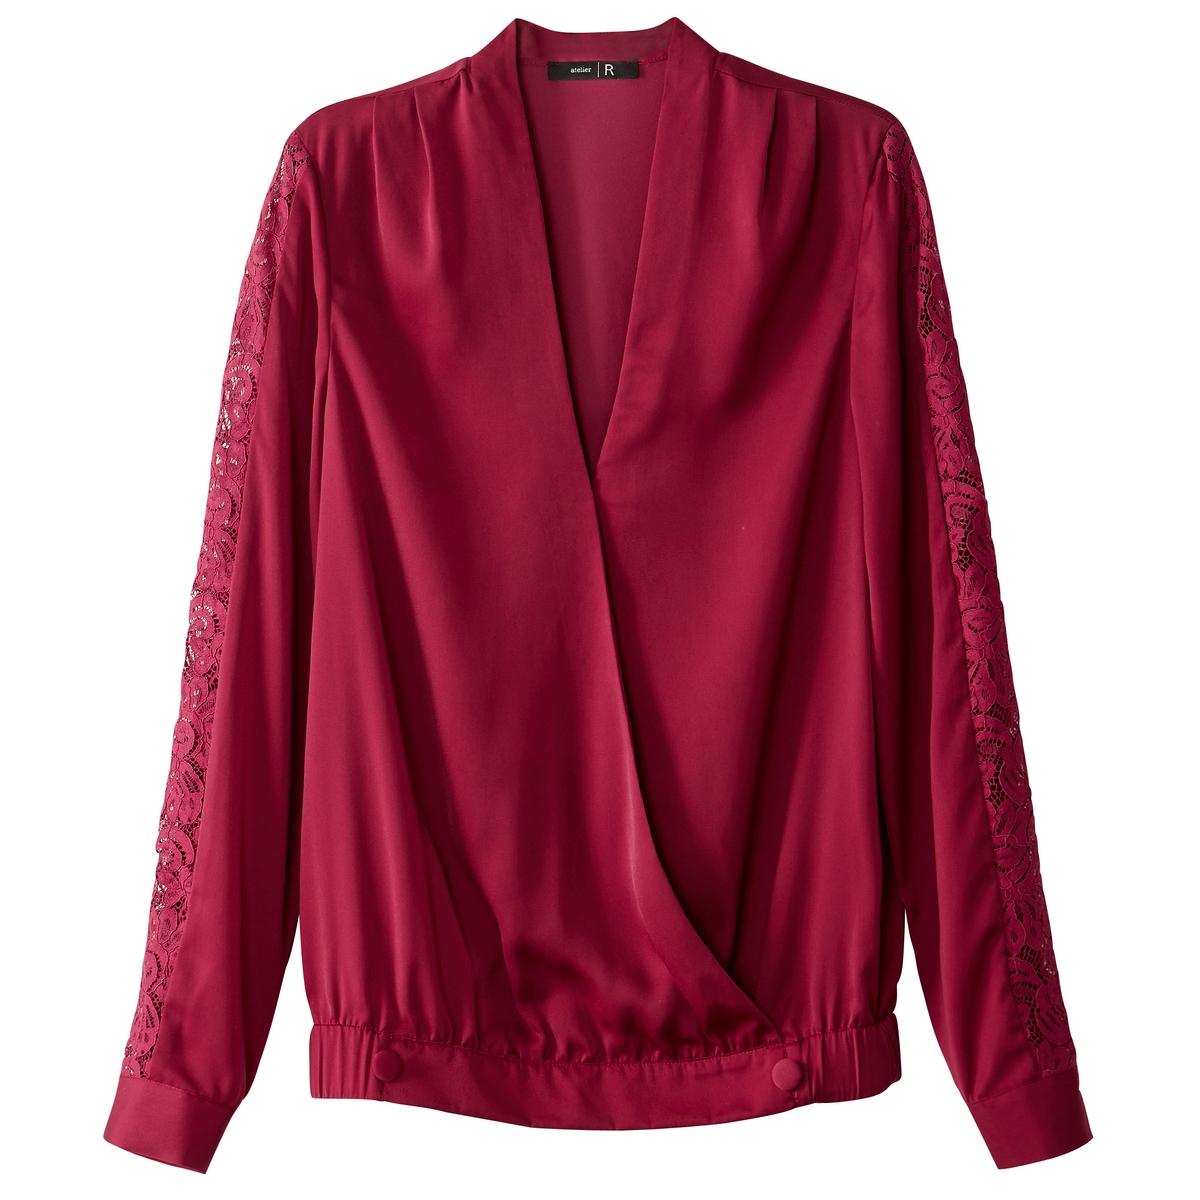 Блузка с запахом из сатина и кружева